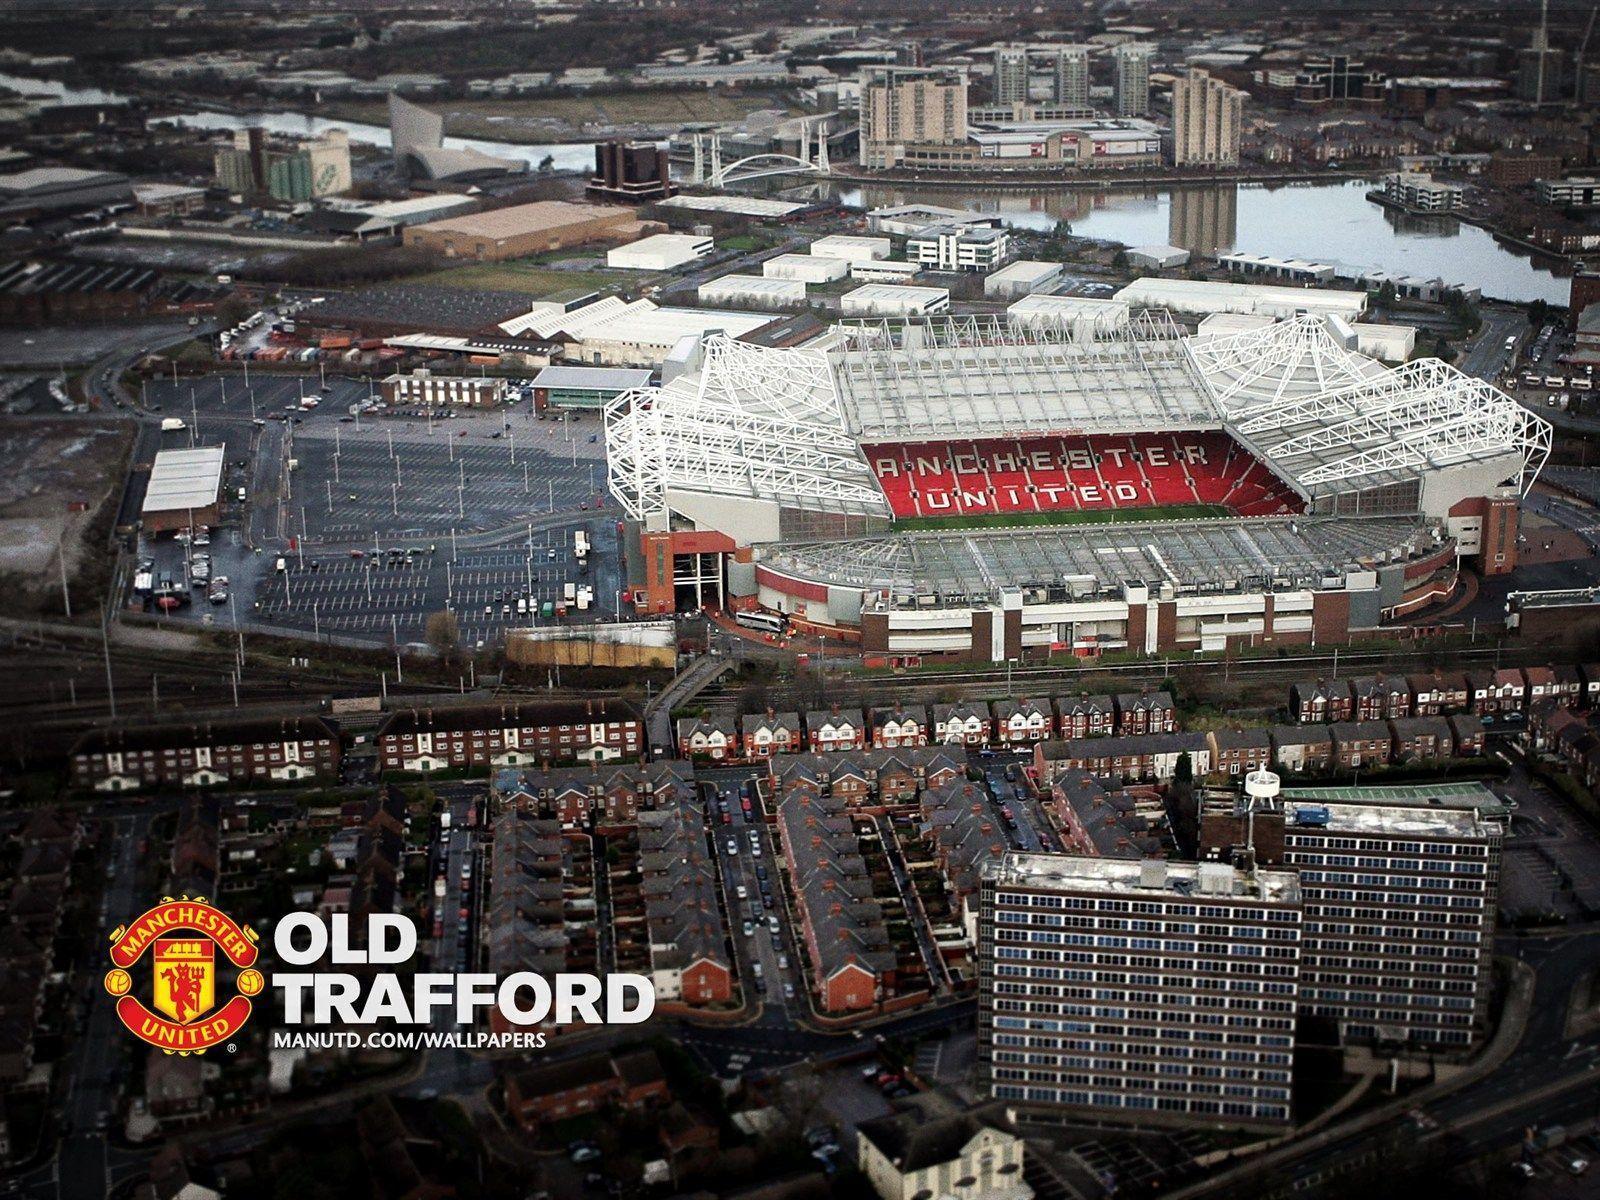 Old Trafford United Wallpaper Football HD Wallpapers